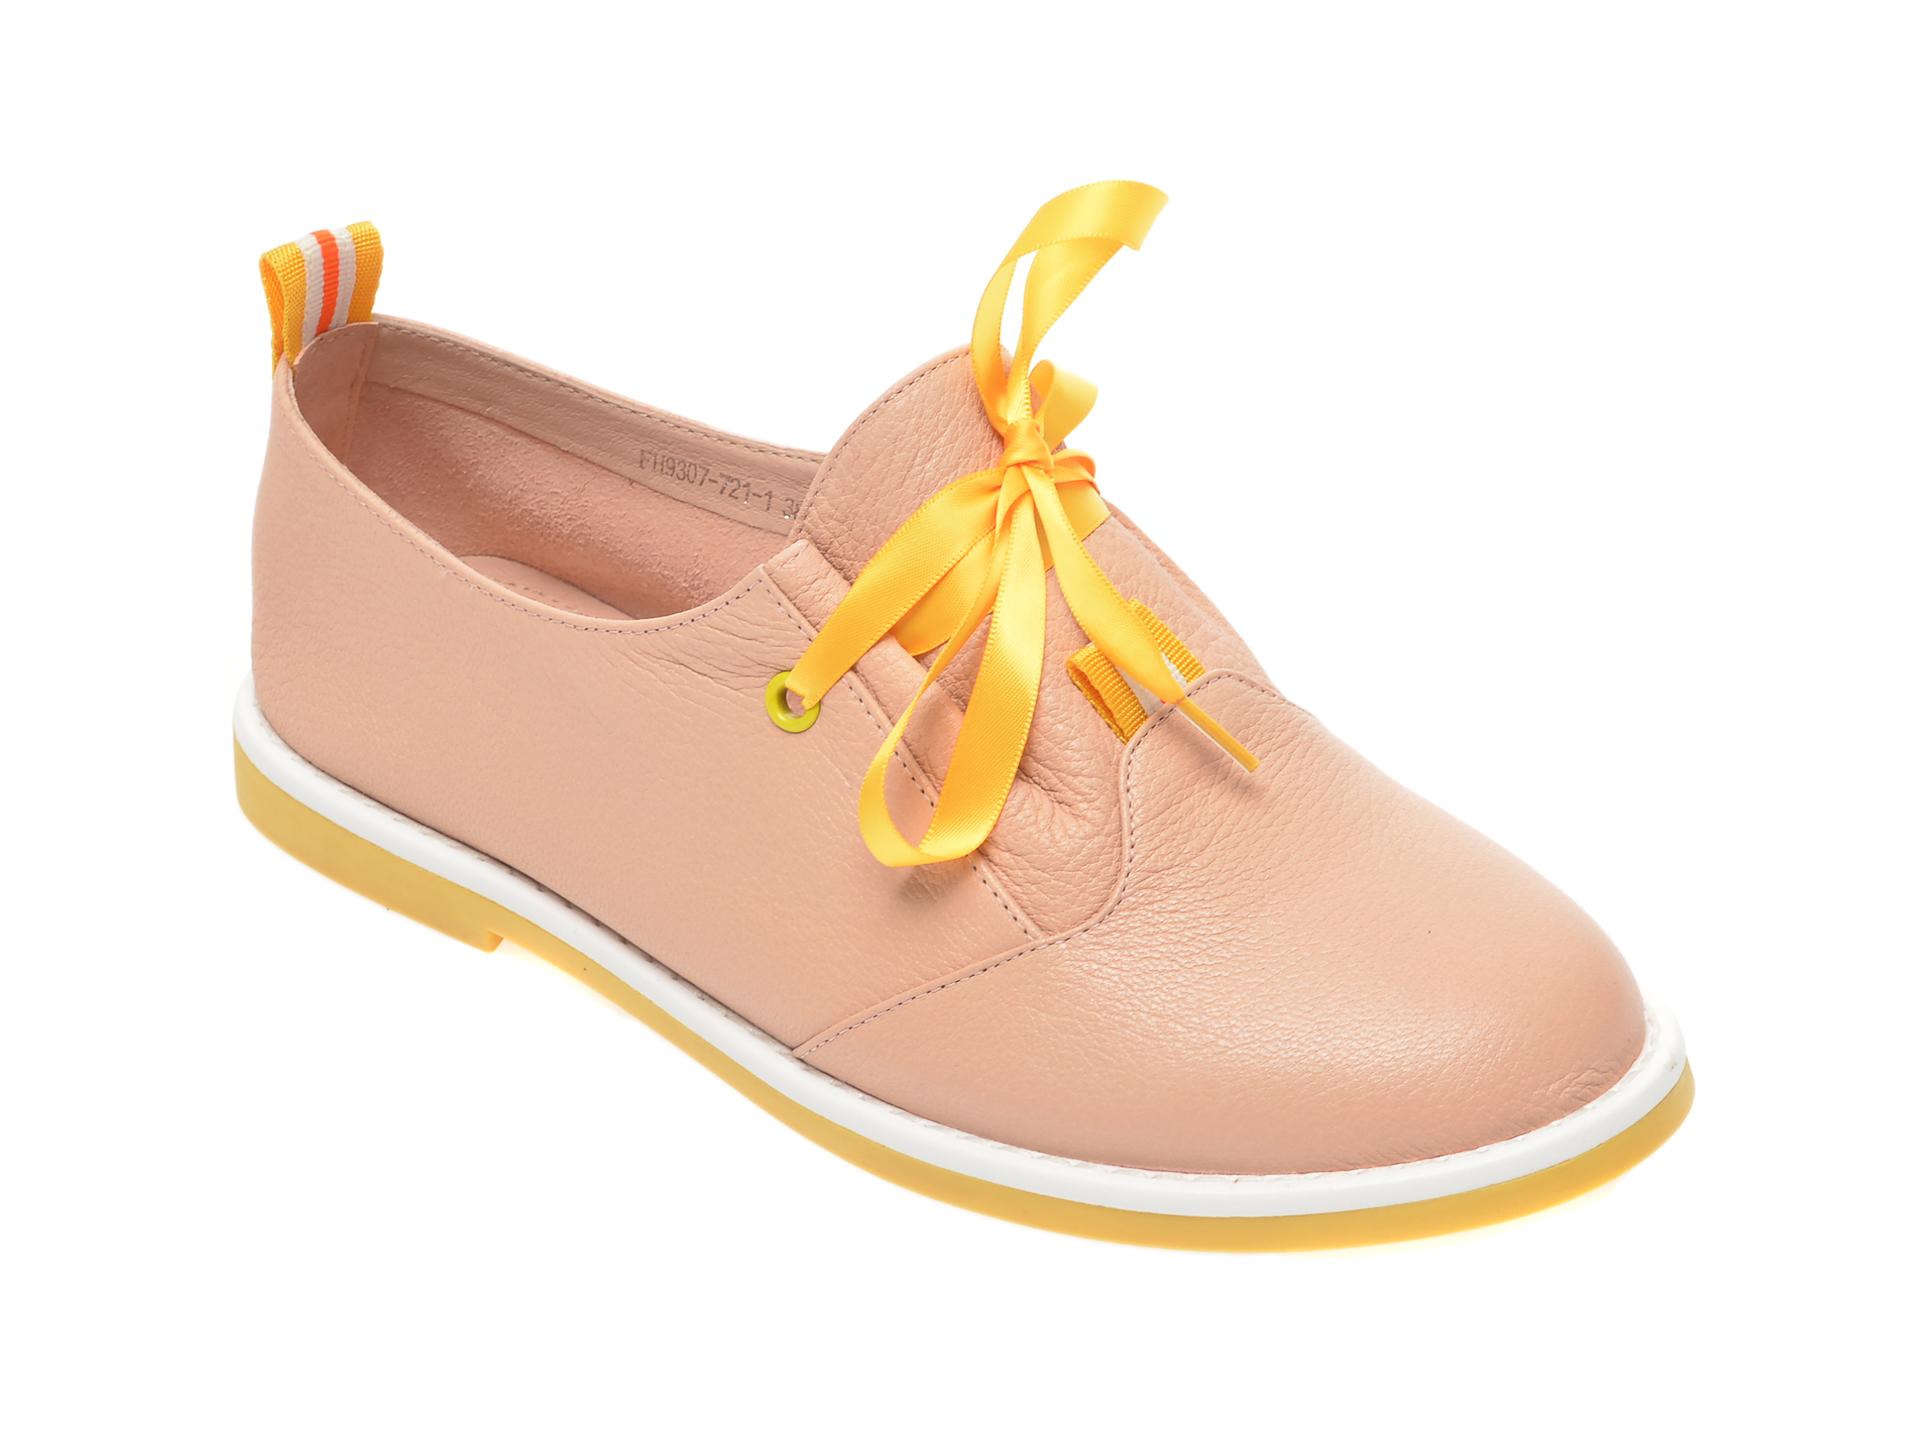 Pantofi FLAVIA PASSINI nude, FH93077, din piele naturala